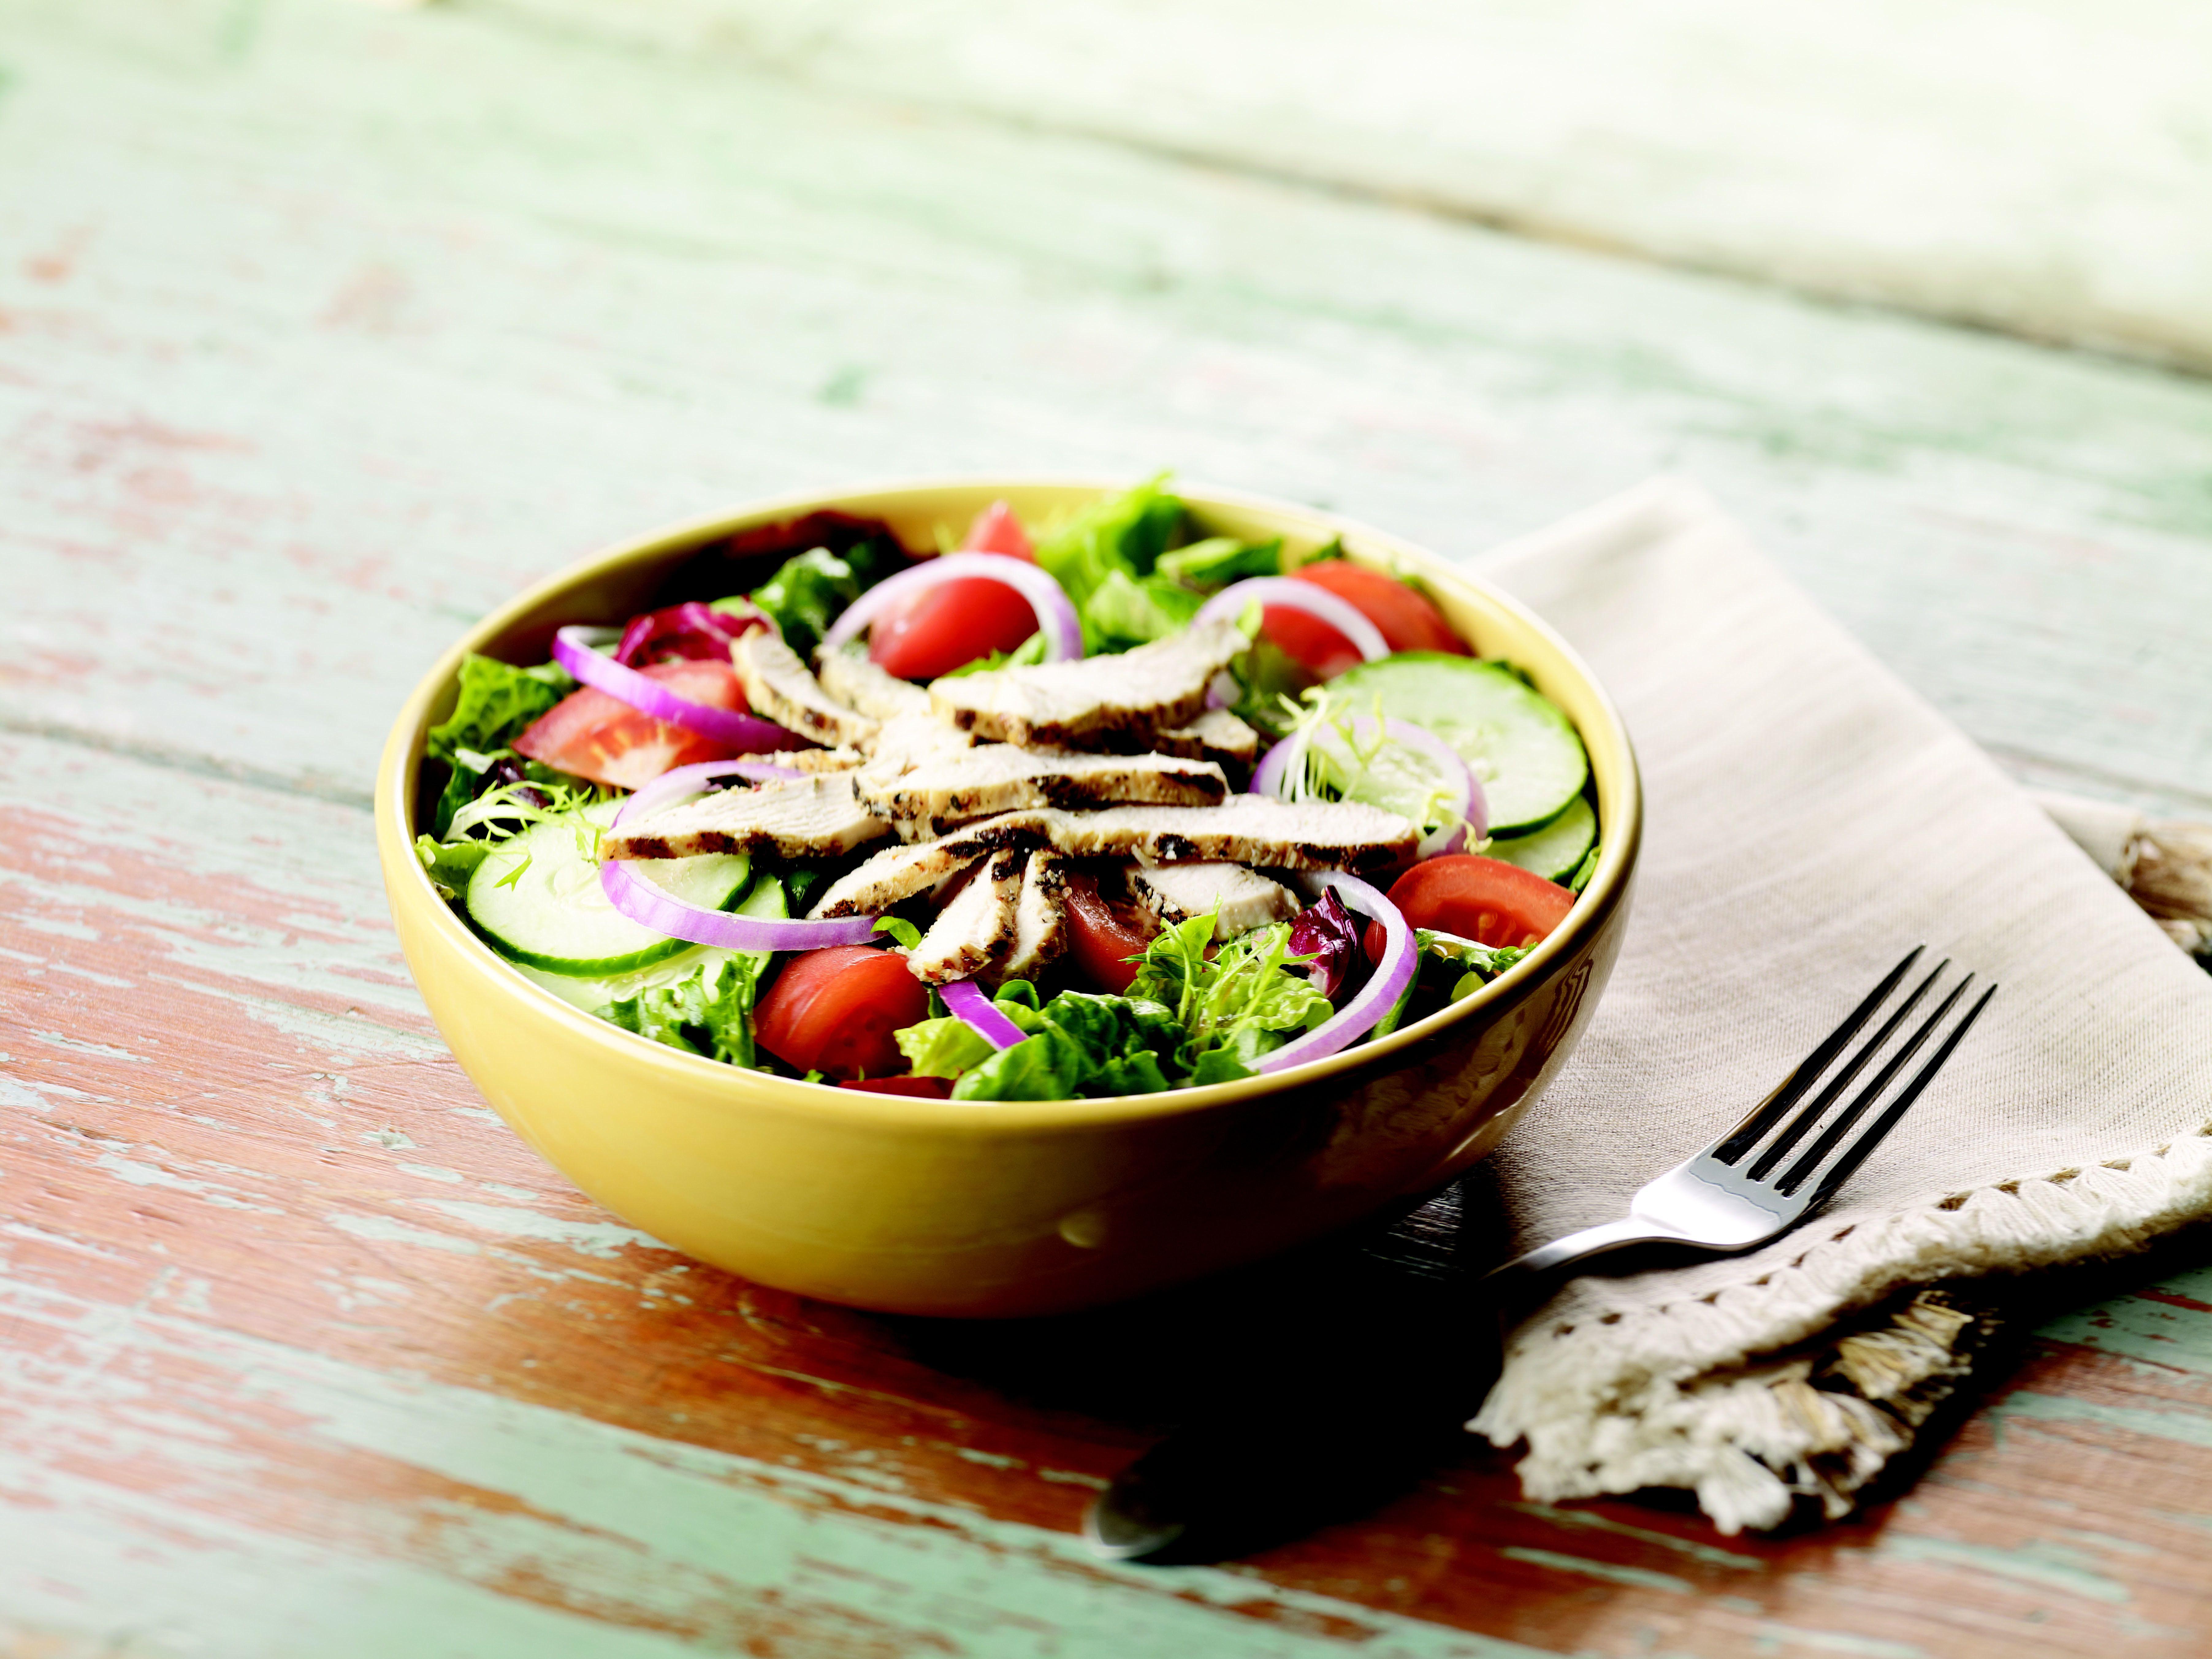 Panera Bread Healthy Choice  Panera Nutrition Facts Menu Choices & Calories